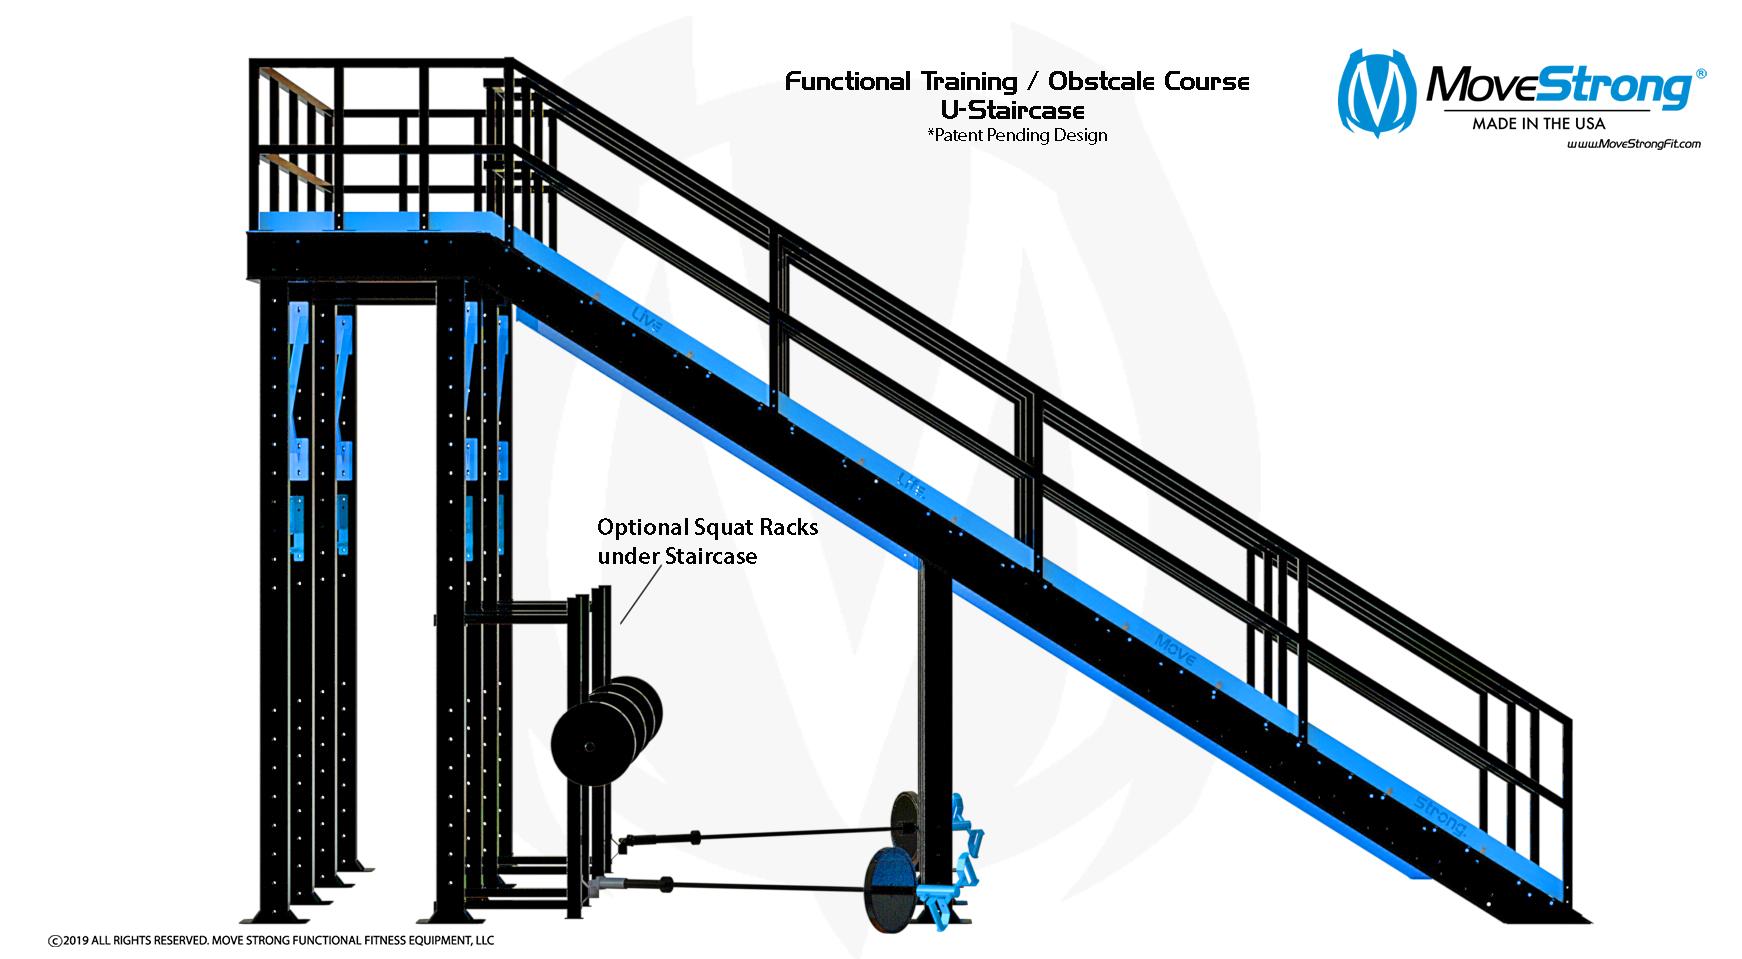 Stair Training Assy - U-Shaped - 15_logos-Squat Racks under.png